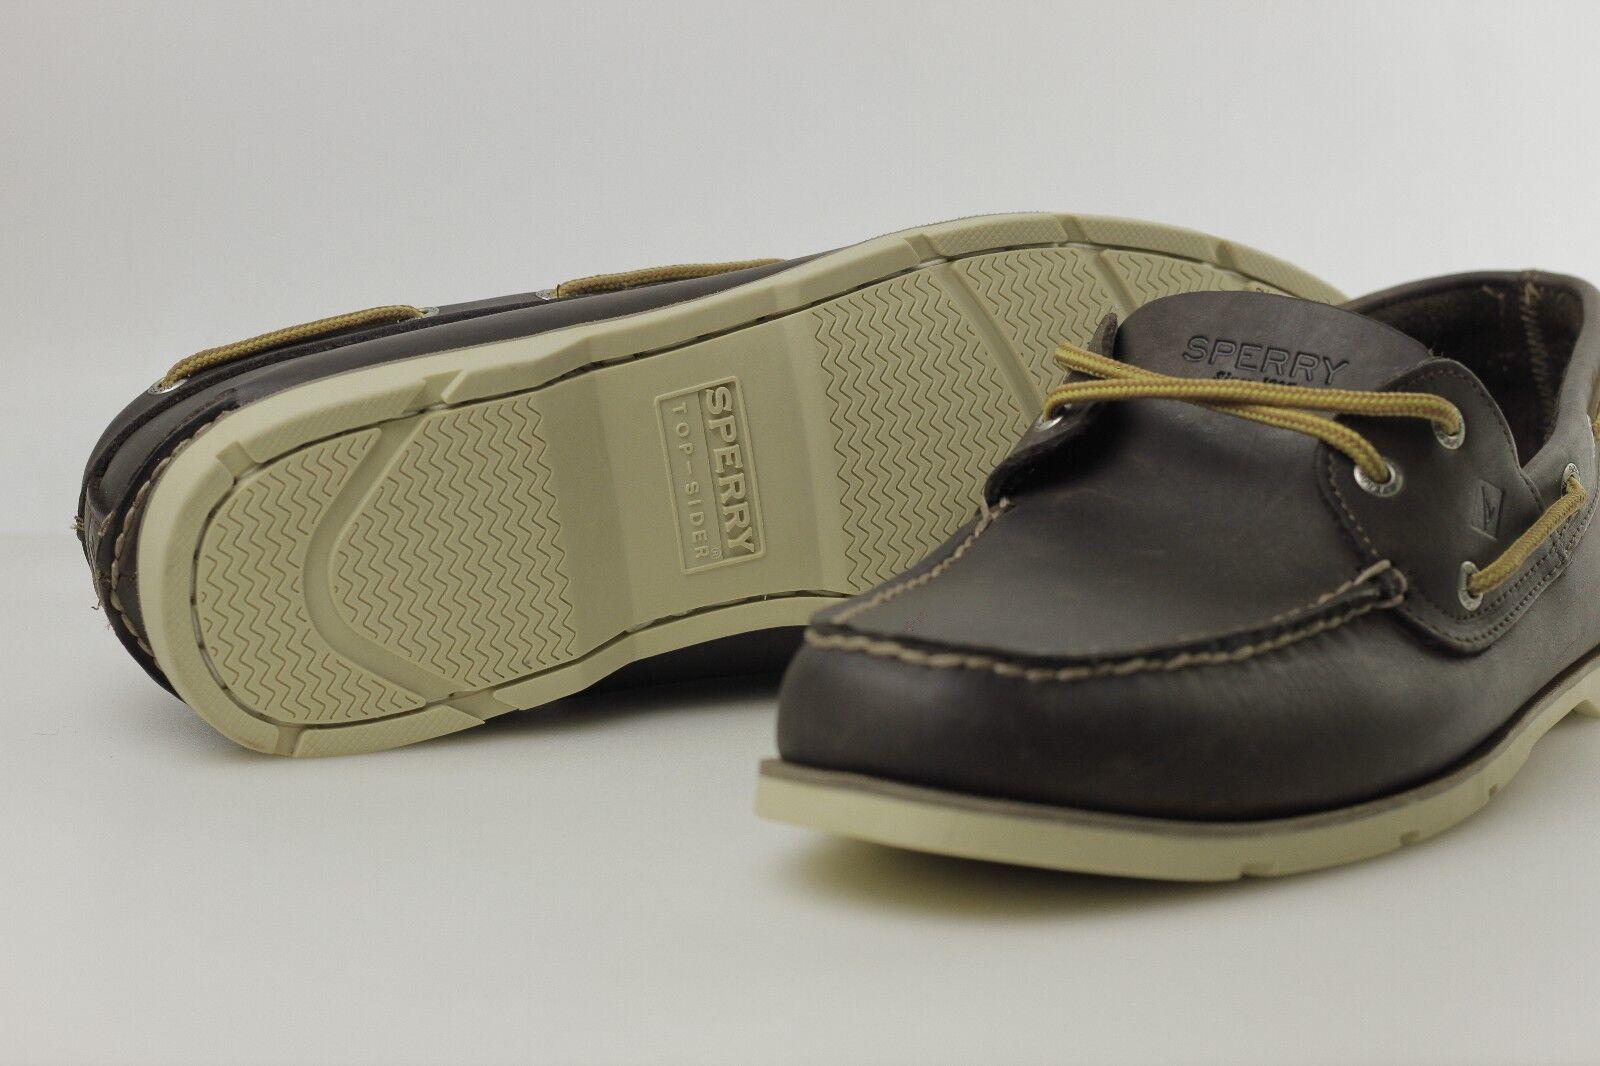 produttori fornitura diretta Sperry Top-Sider Leeward 2-EYE 2-EYE 2-EYE Boat scarpe Uomo Dimensione 14M (0770594) NWOB  Garanzia di vestibilità al 100%